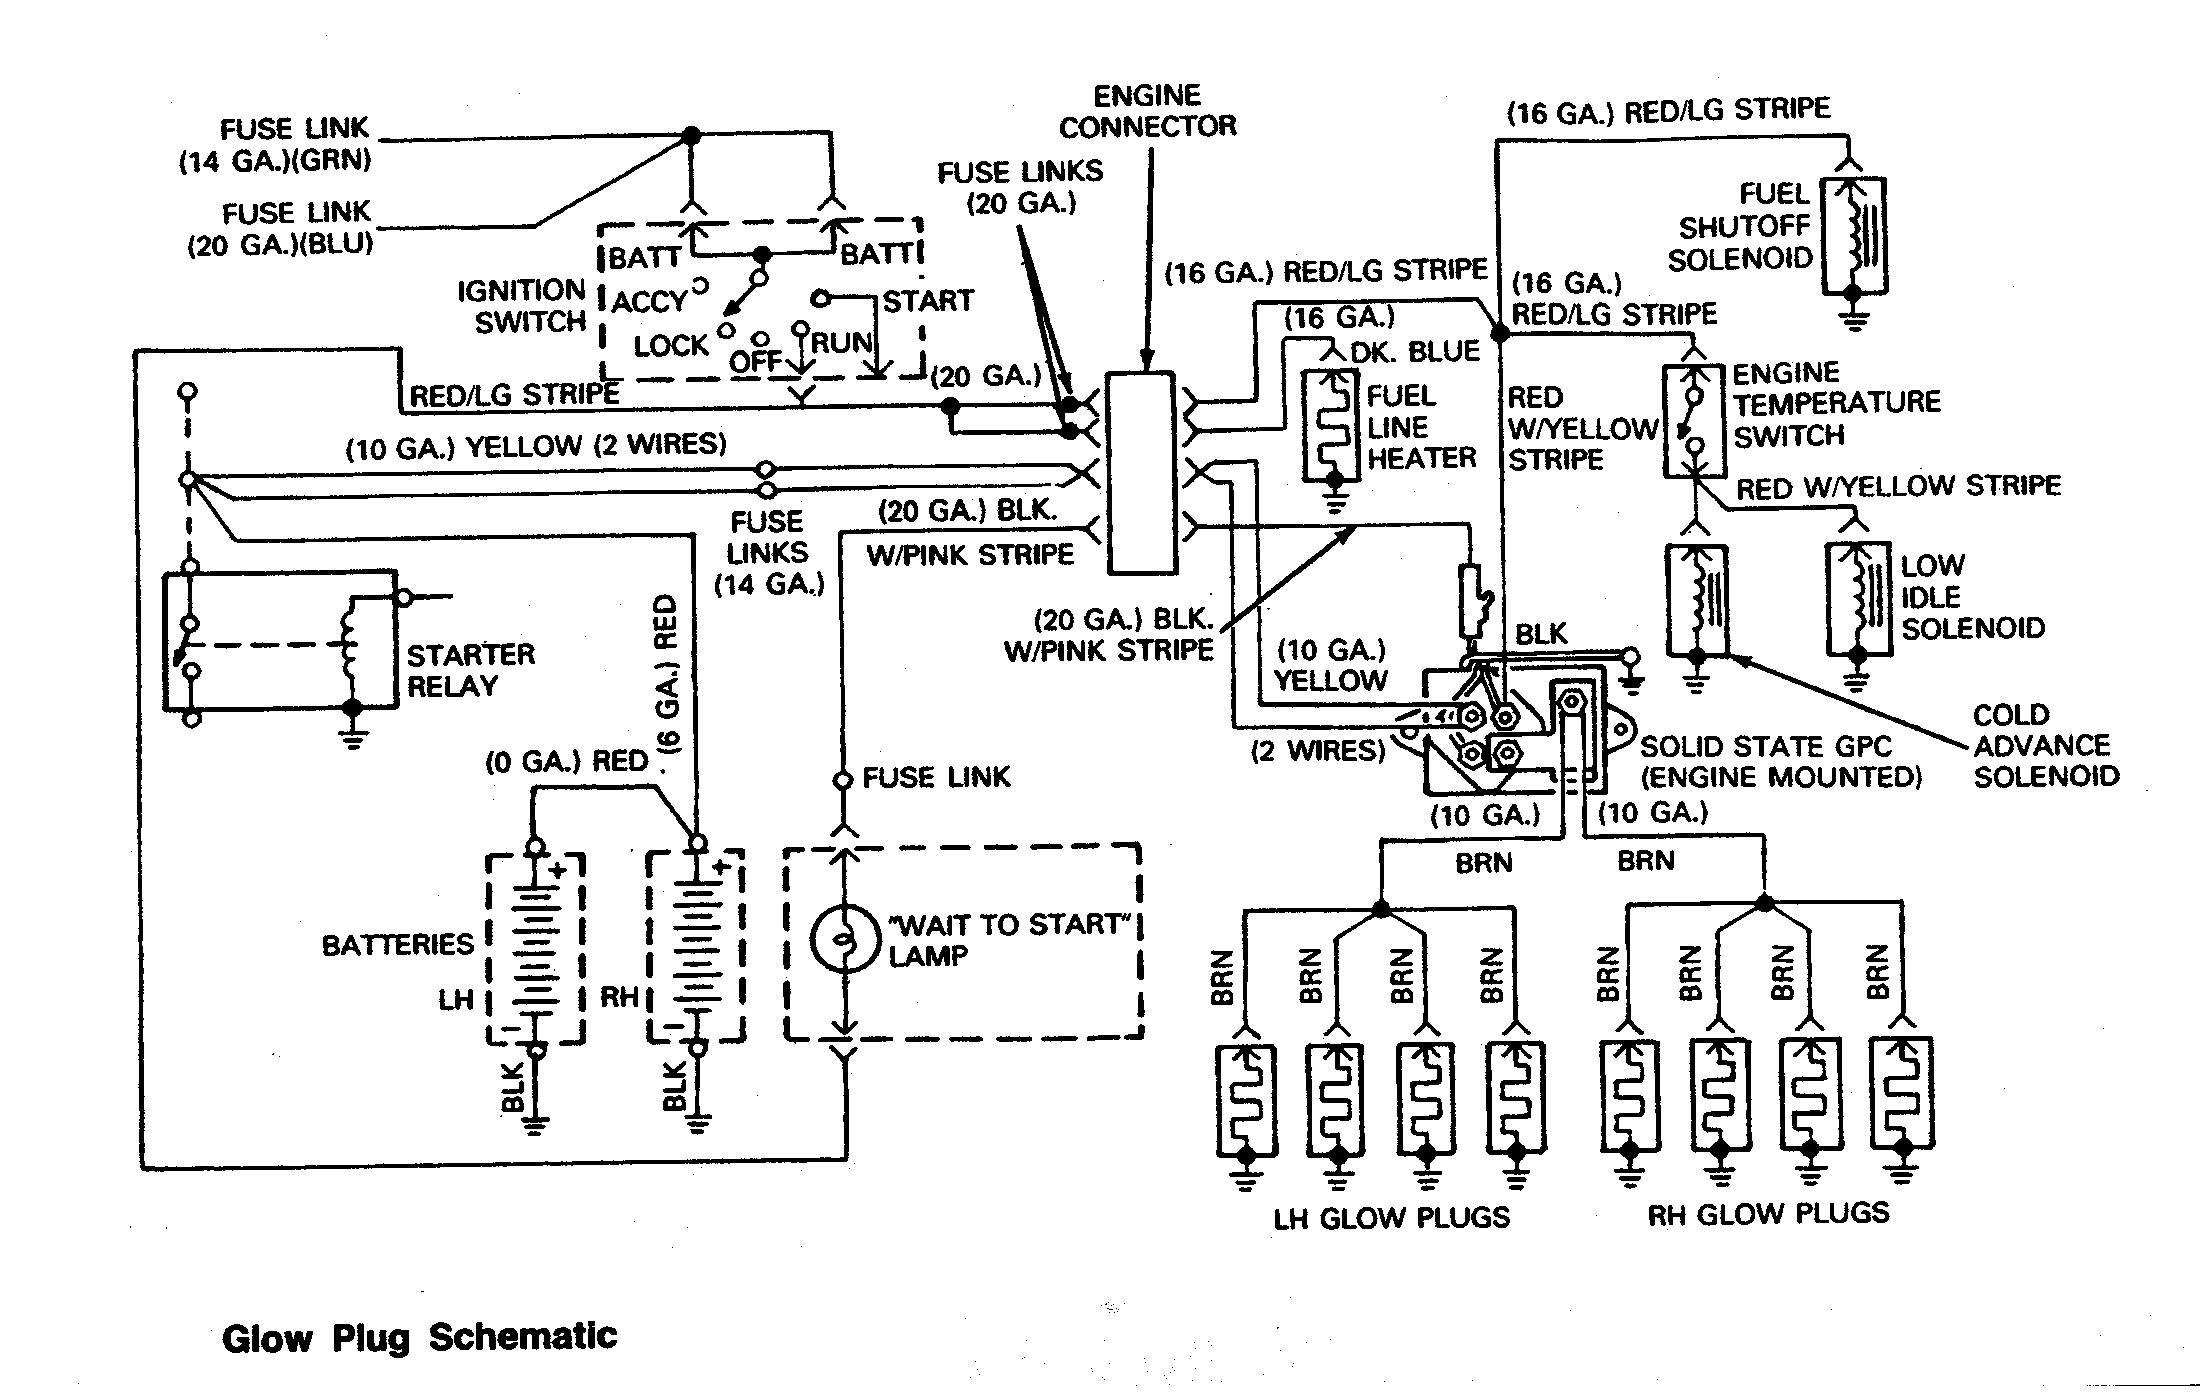 Dirt Bike Engine Diagram Glow Engine Diagram Experts Wiring Diagram • Of Dirt Bike Engine Diagram